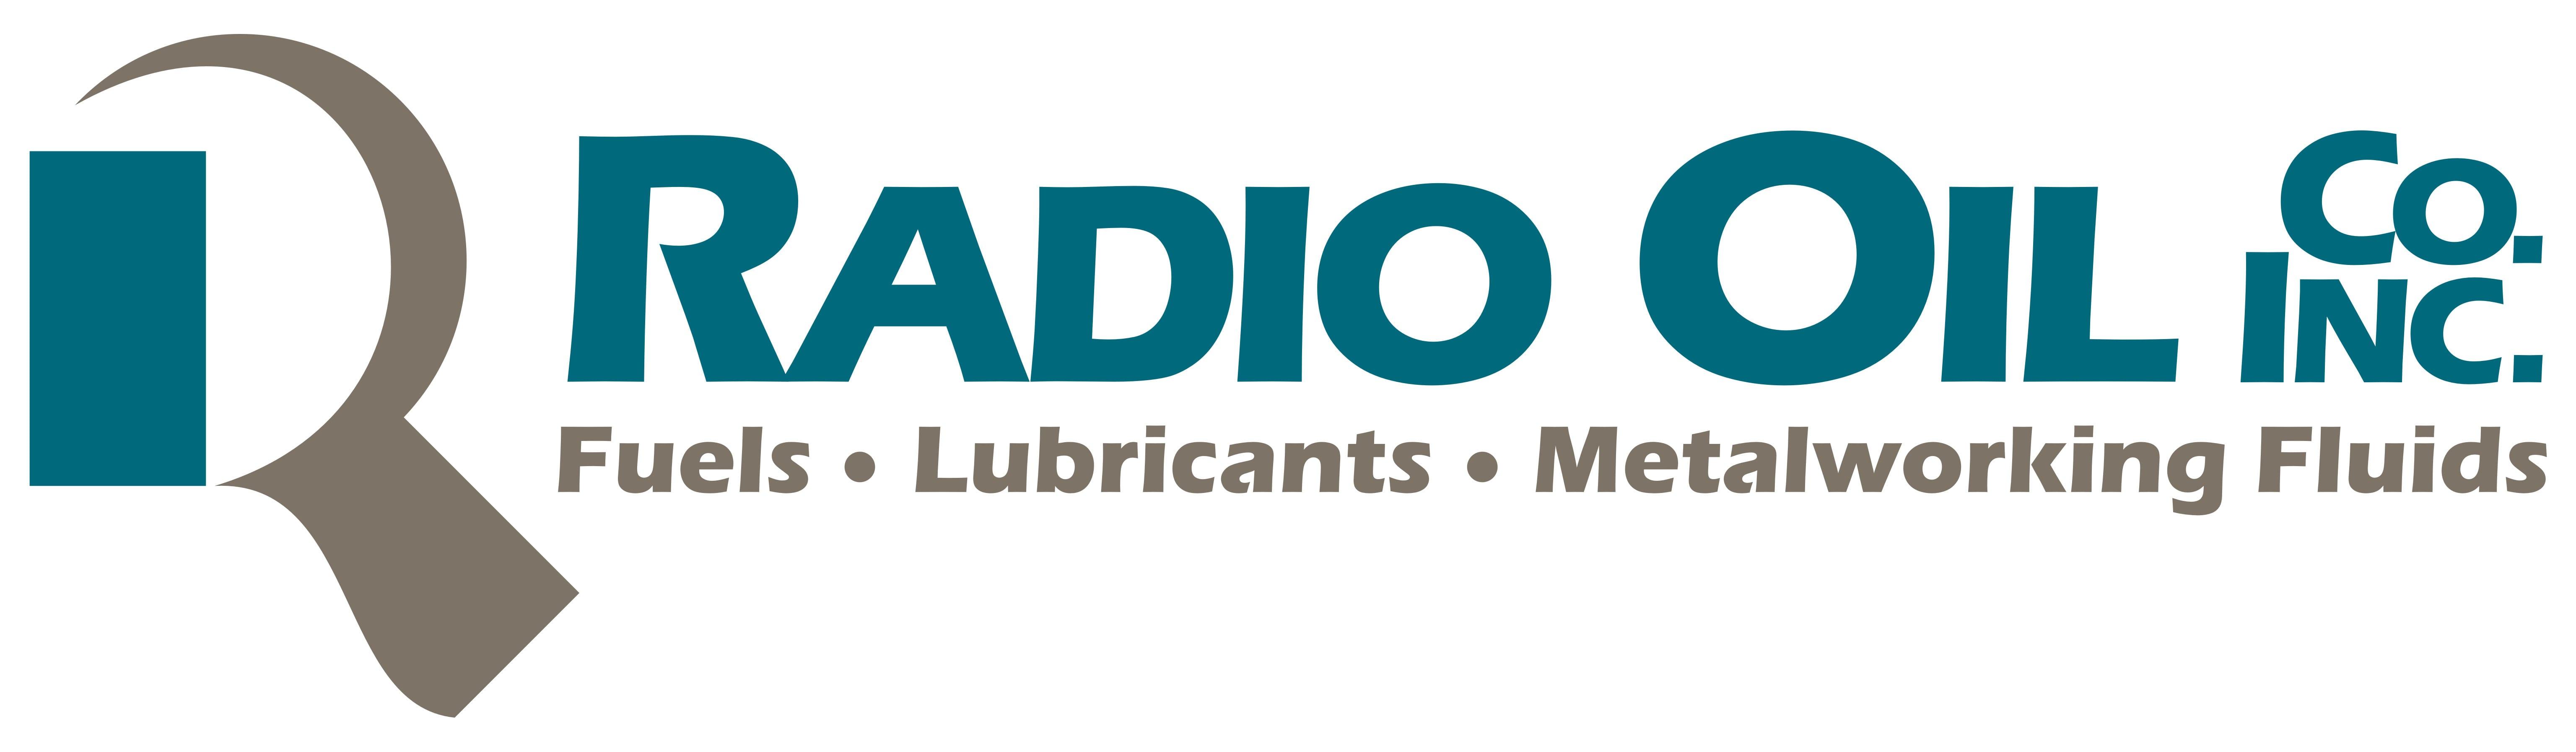 Radio Oil Co.